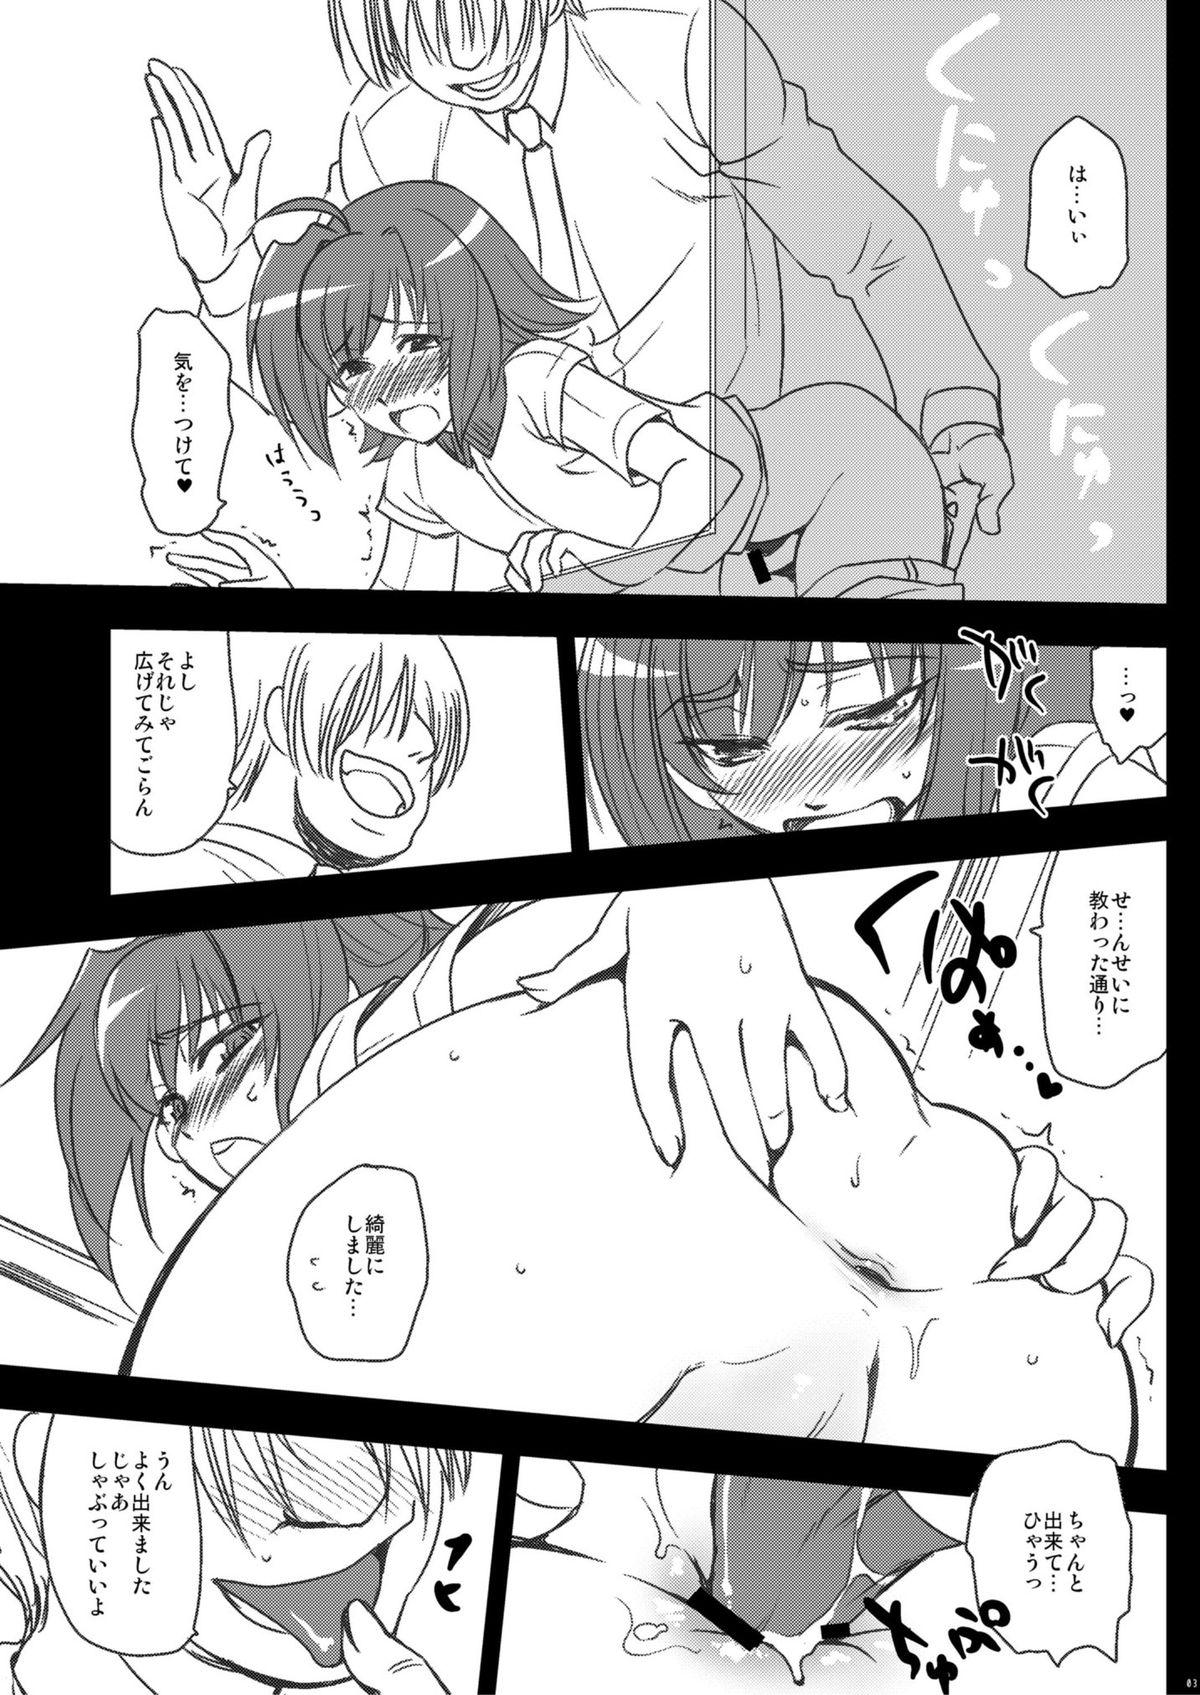 Tachikawa Negoro(kitsune)Tutor ride! Attack in Aichi!(Cardfight!! Vanguard) 2